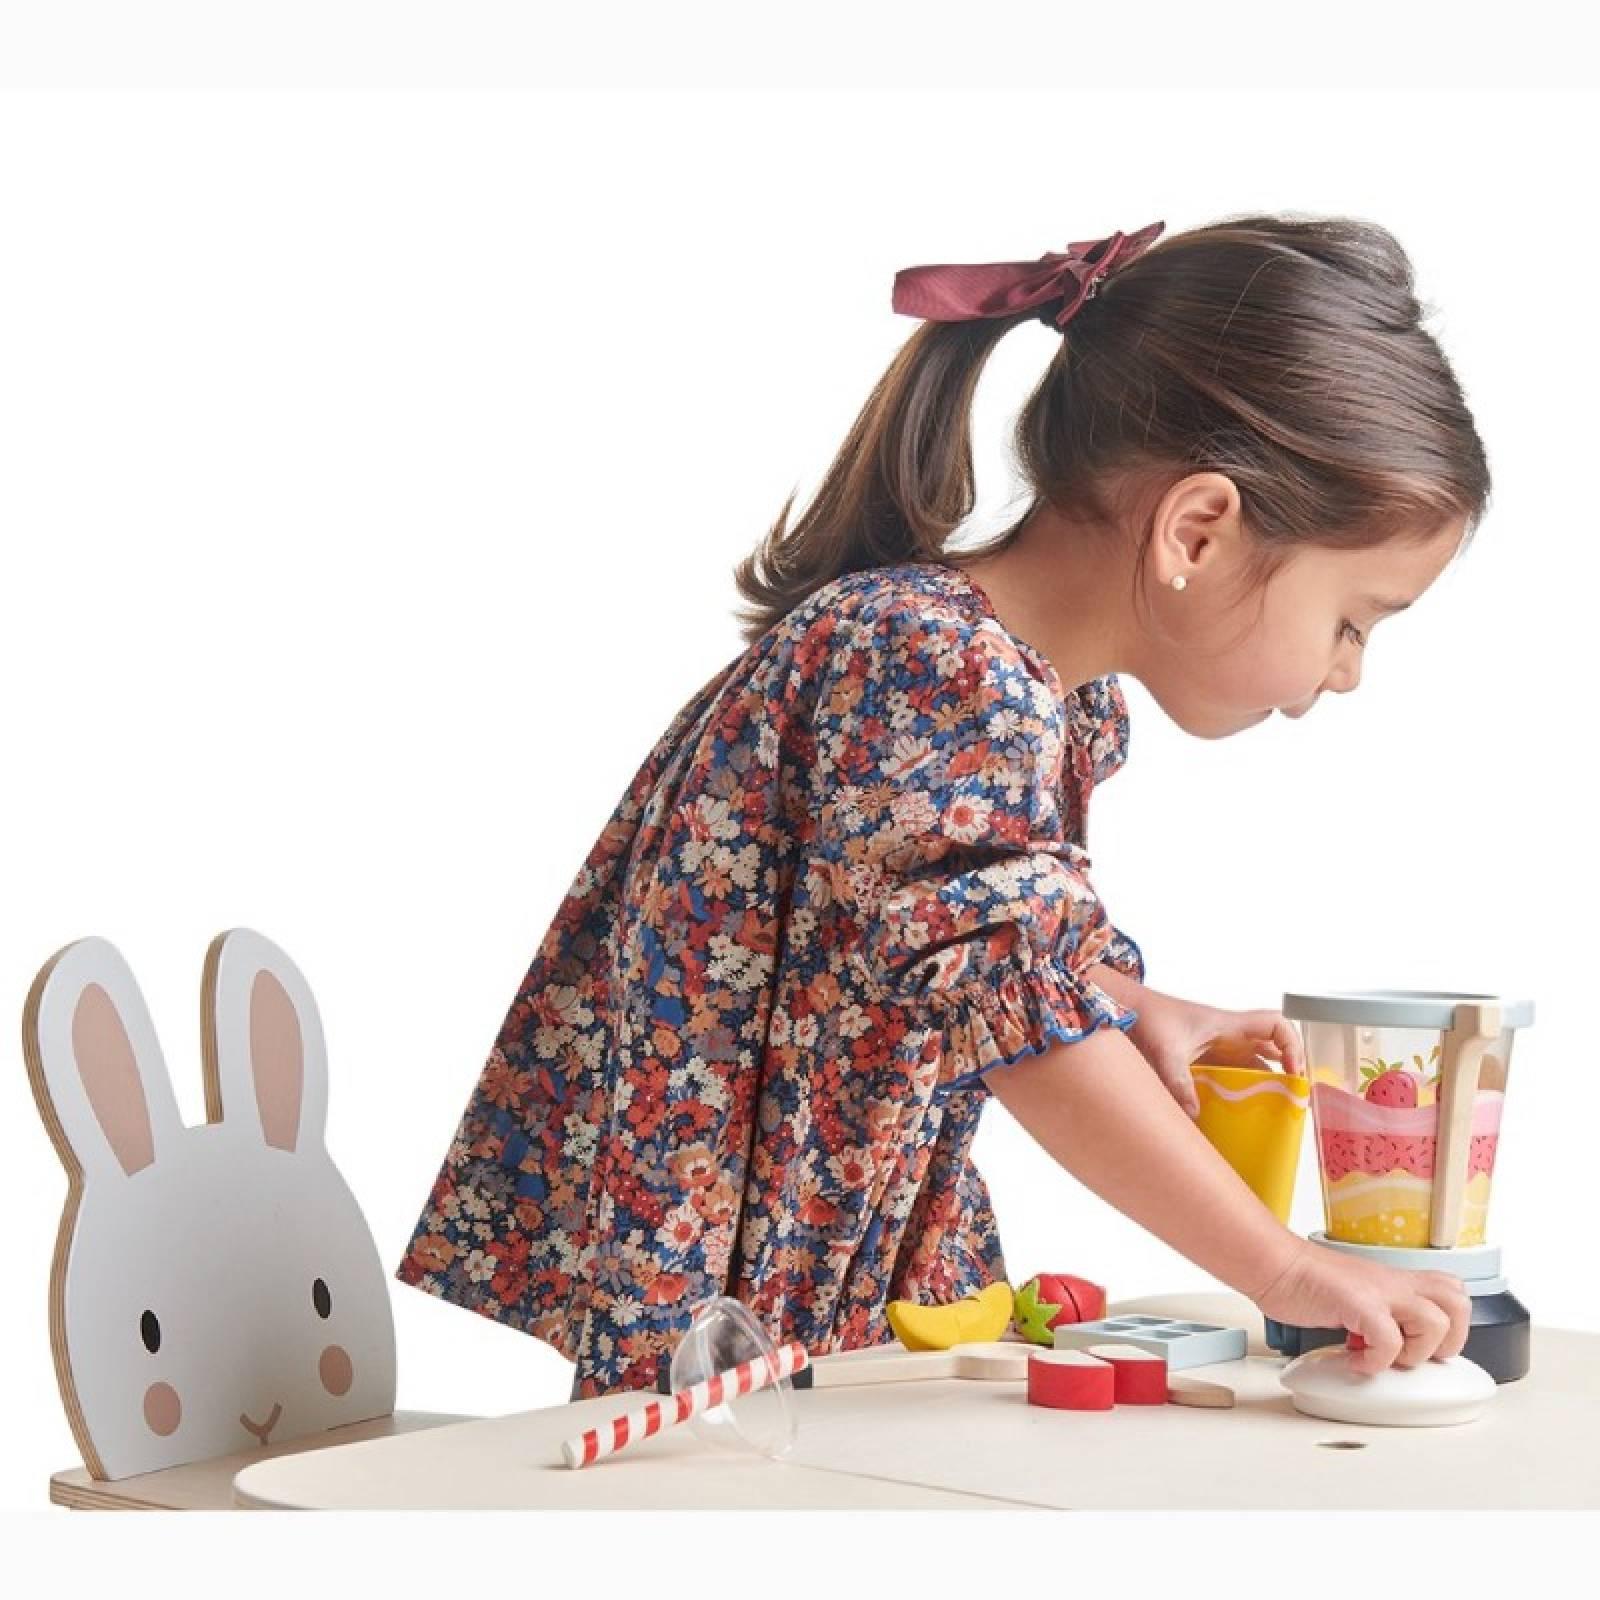 Fruity Blender Wooden Play Food Toy Set 3+ thumbnails